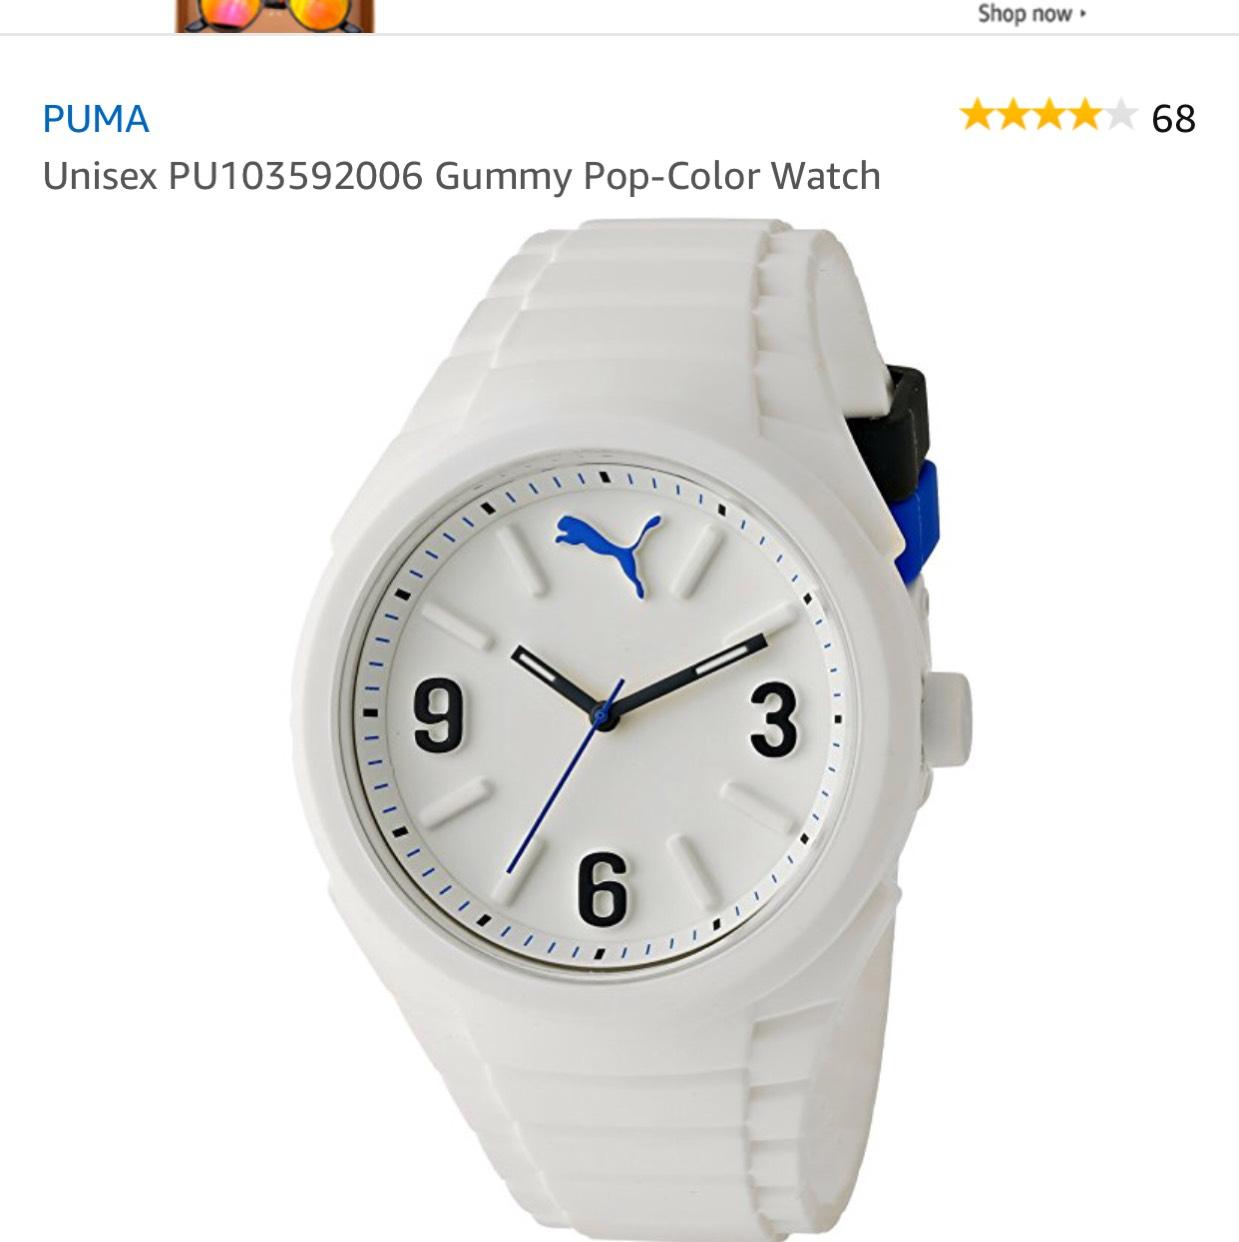 Amazon USA: Reloj Puma Unisex PU103592006 a $697